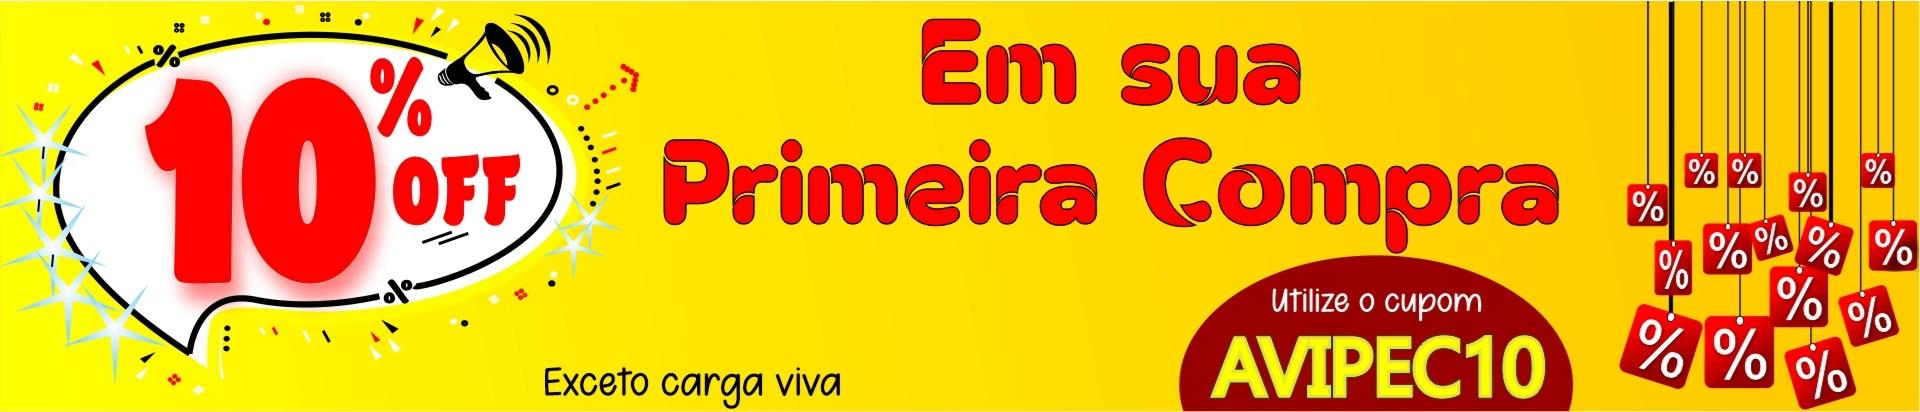 Banner Centro